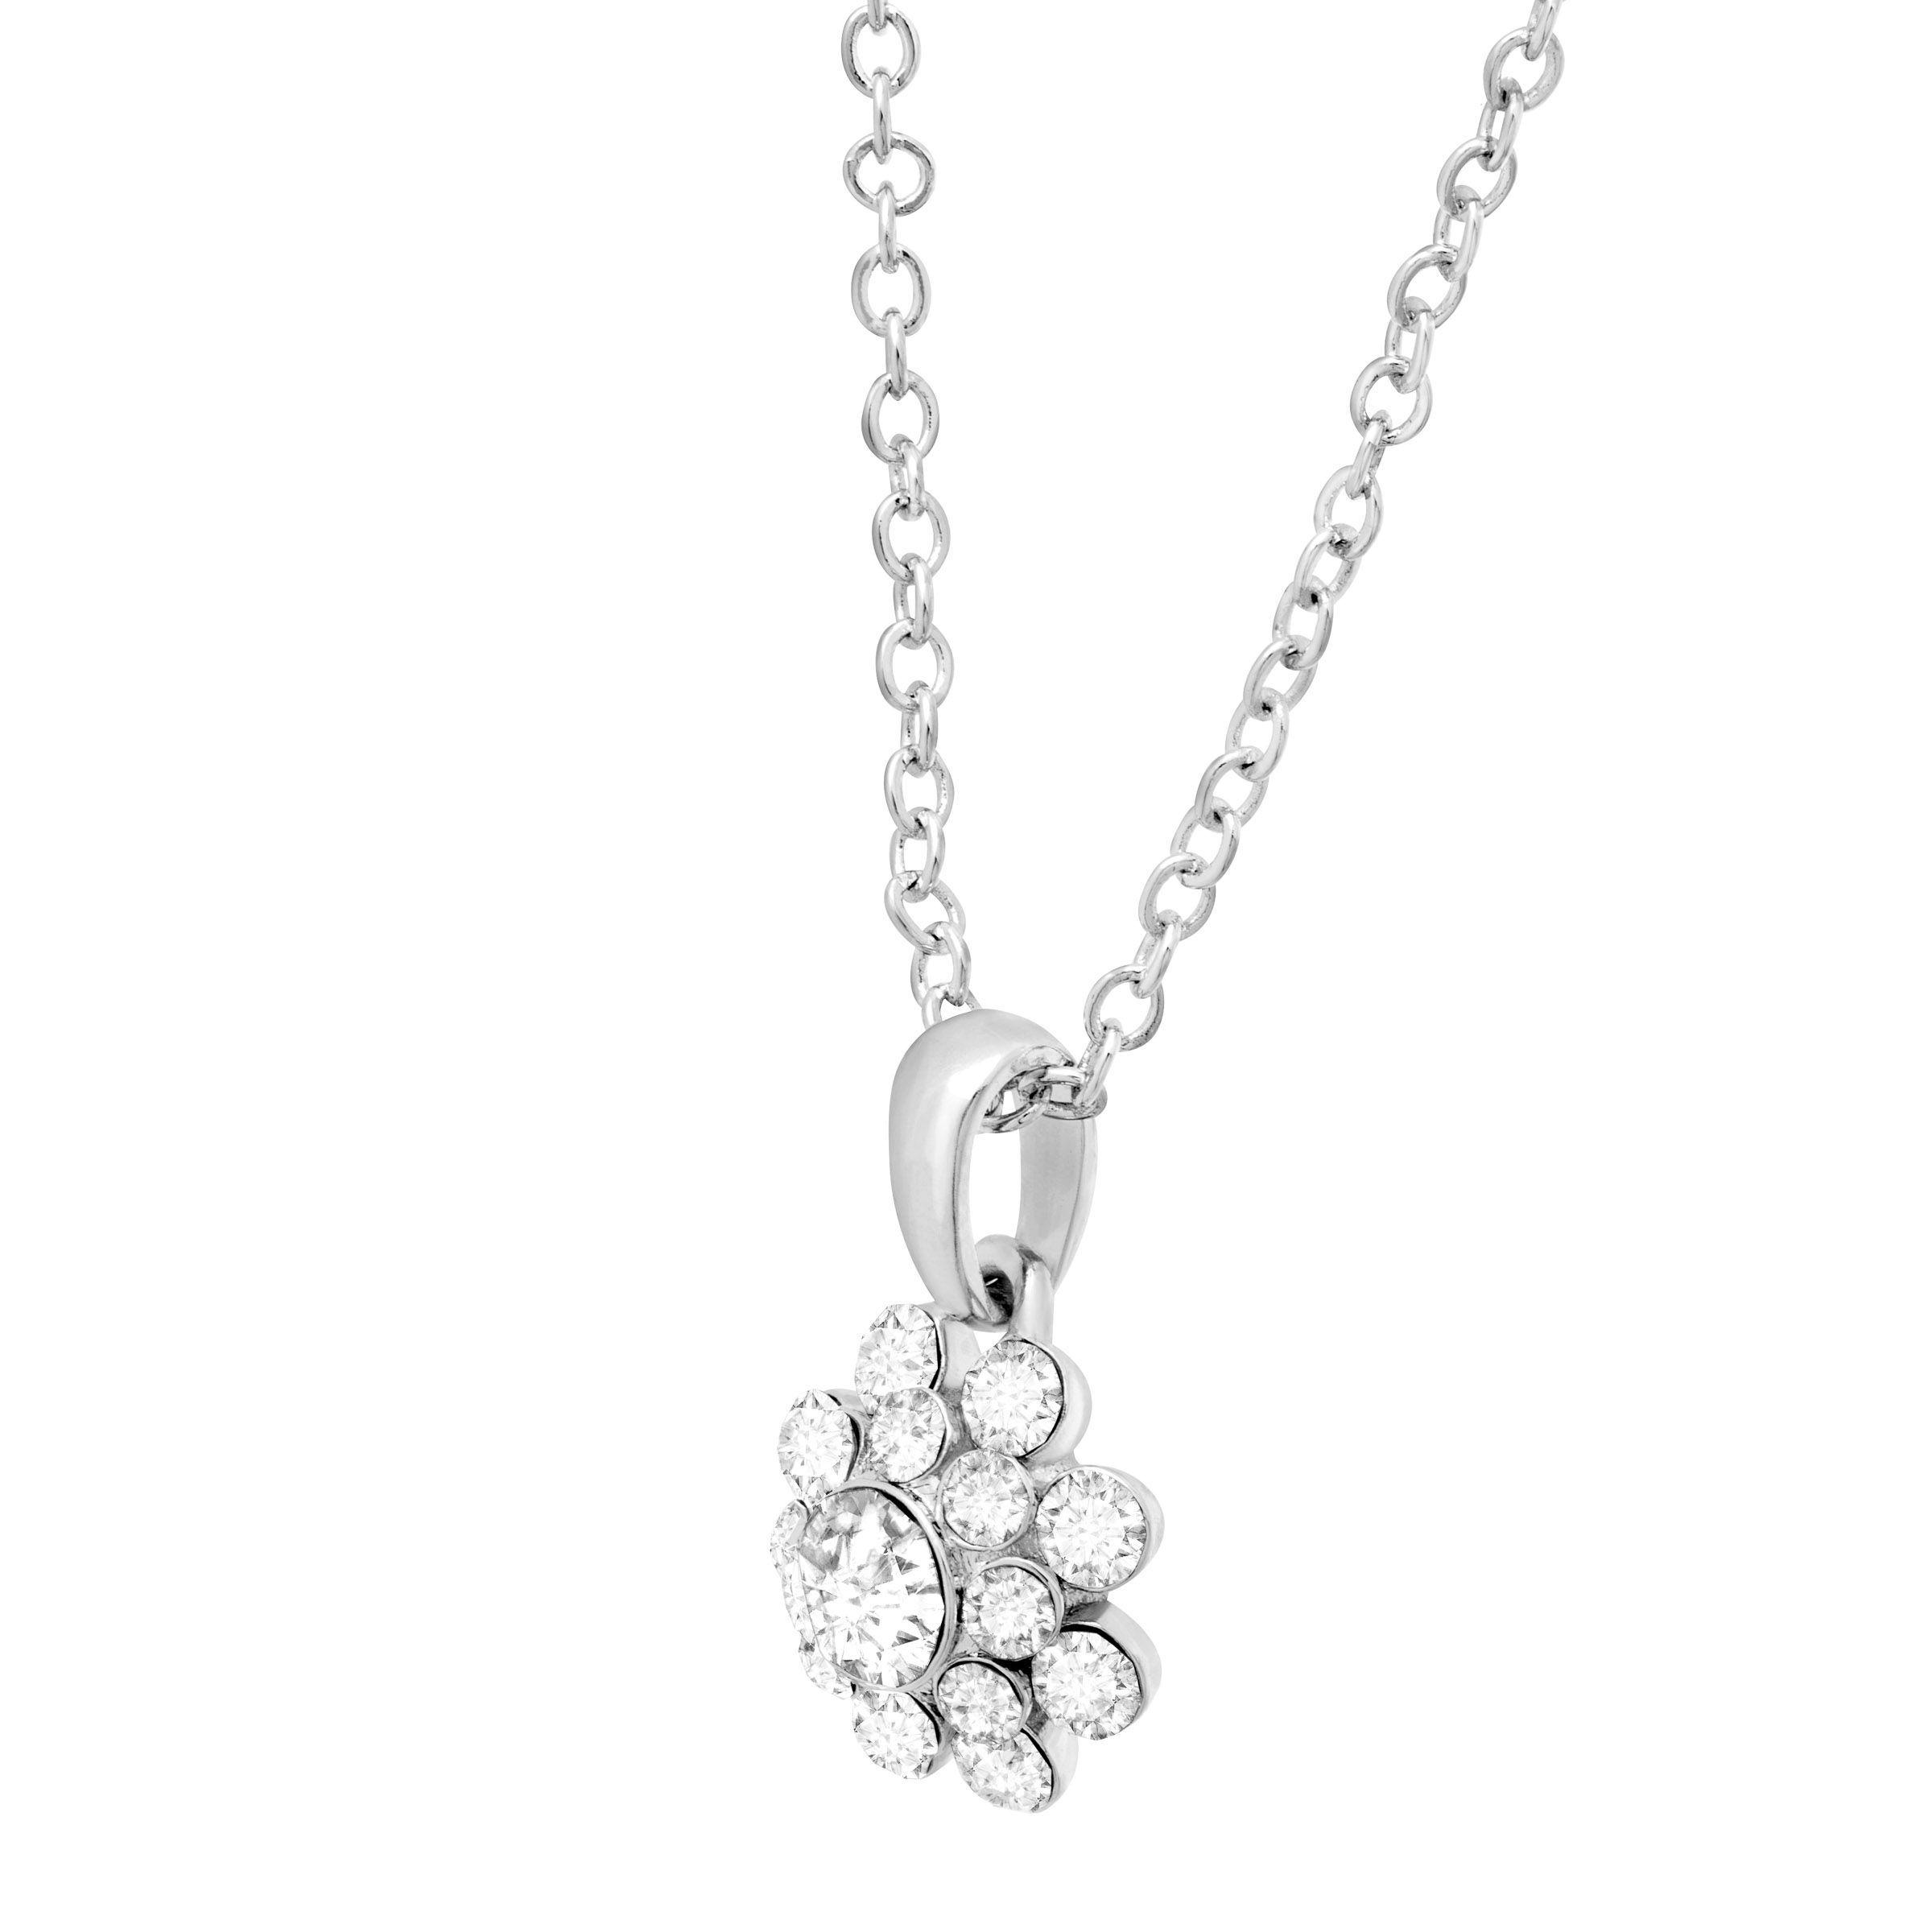 Crystaluxe Swarovski Crystals Flower Pendant in Sterling